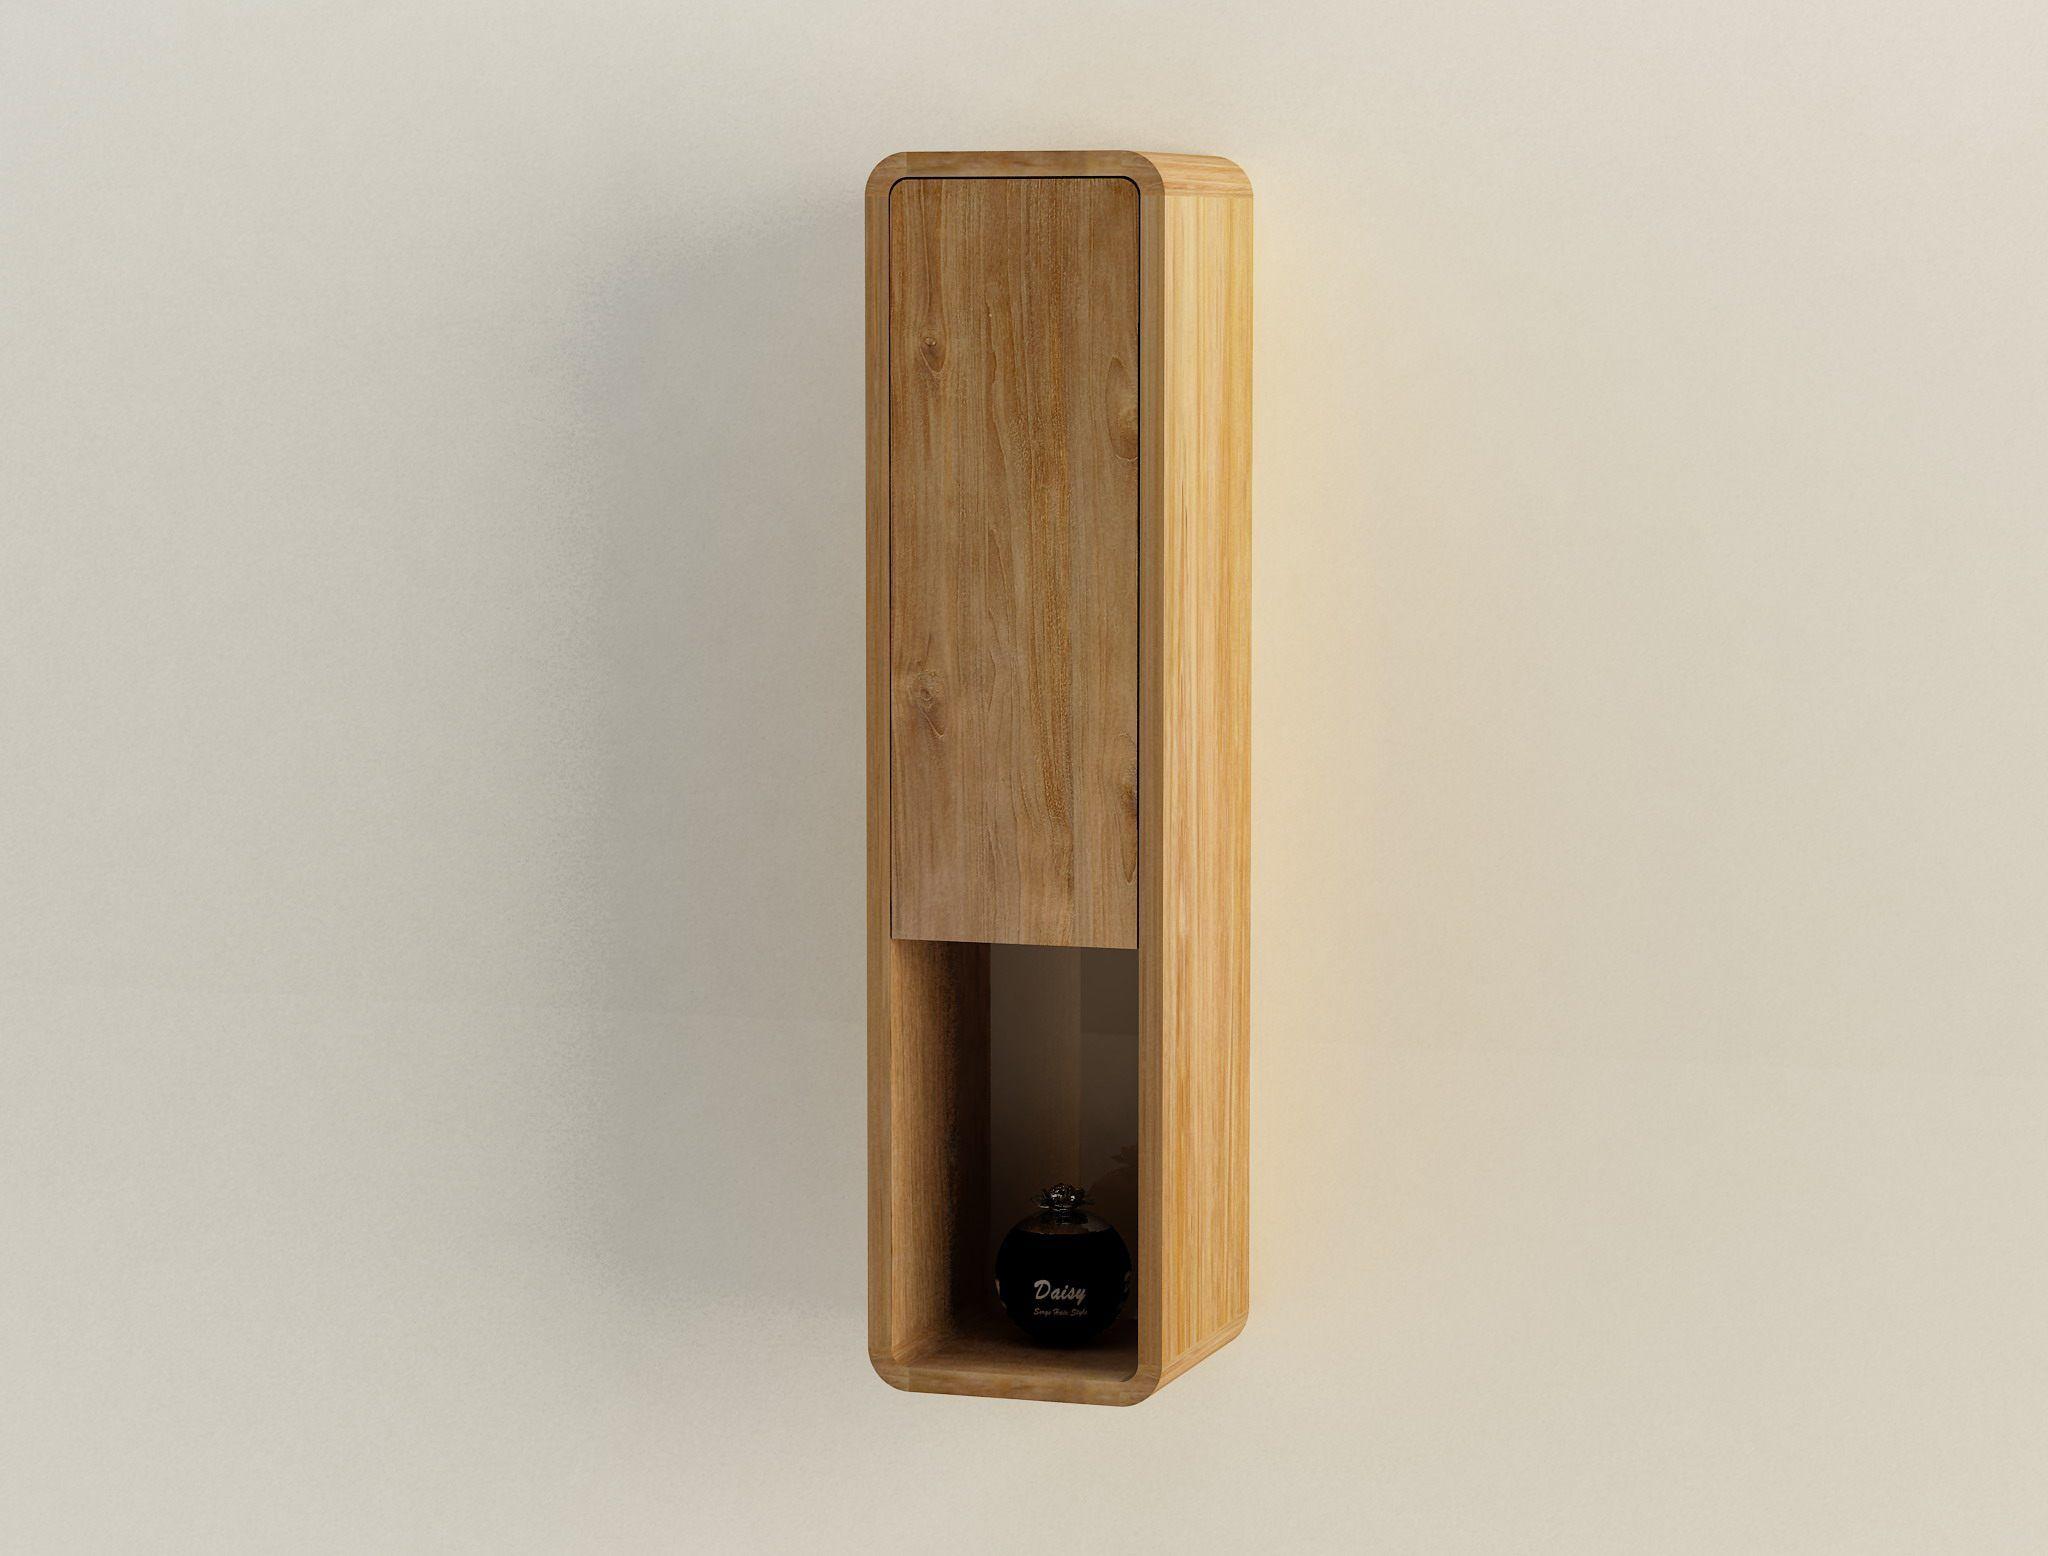 6 Hangeschrank Iria Wandschrank Badschrank Badmobel Teak Holz